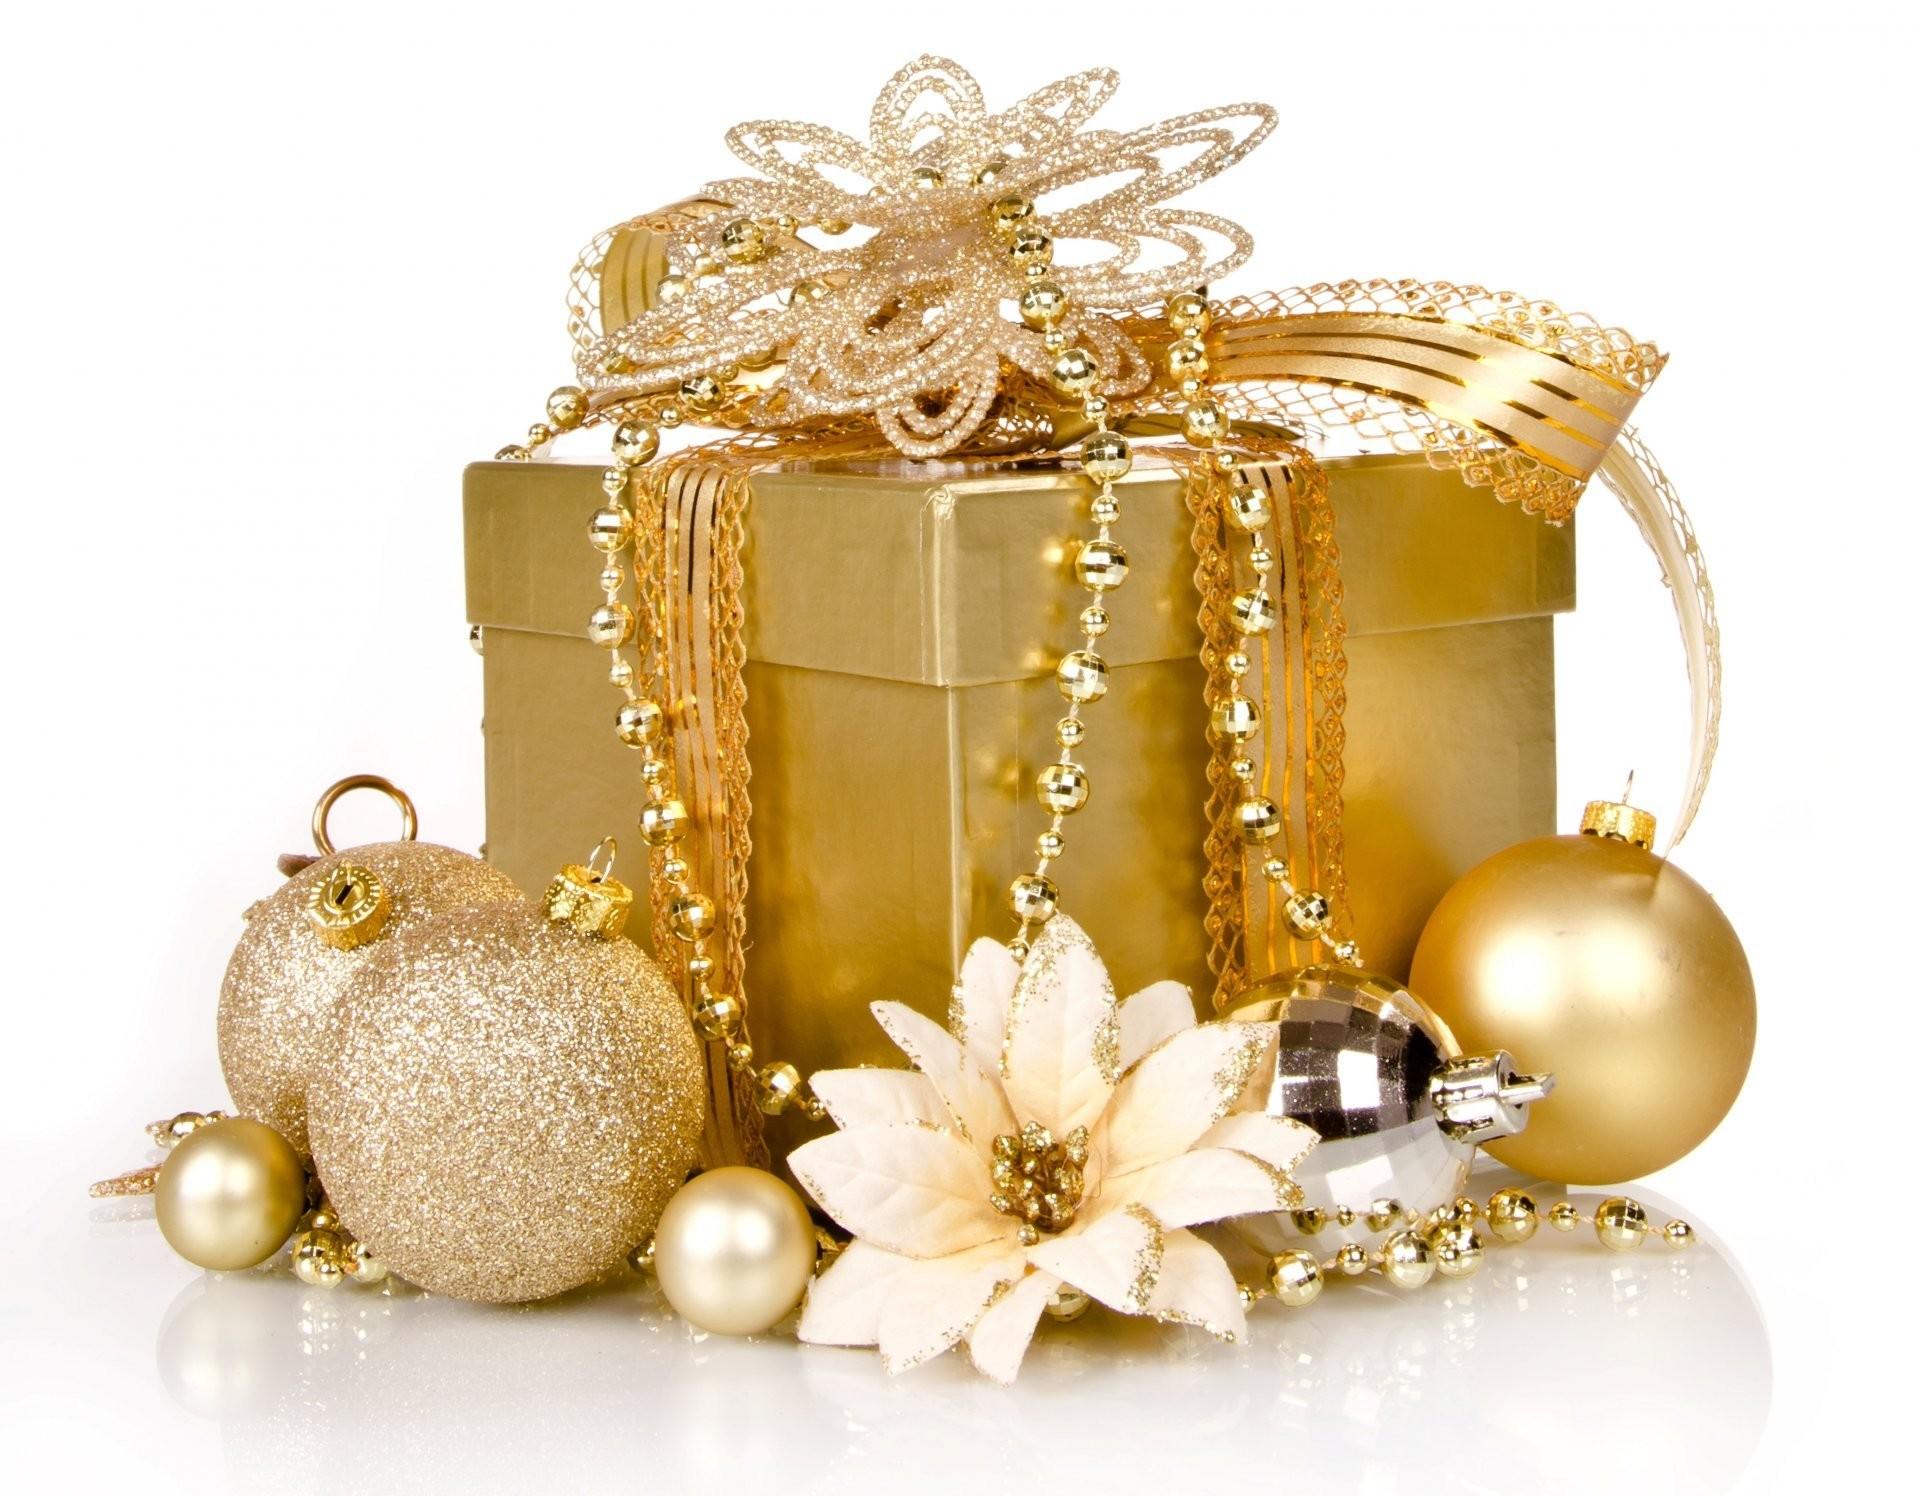 golden xmas merry christmas gift box decoration christmas new year present  gold decoration